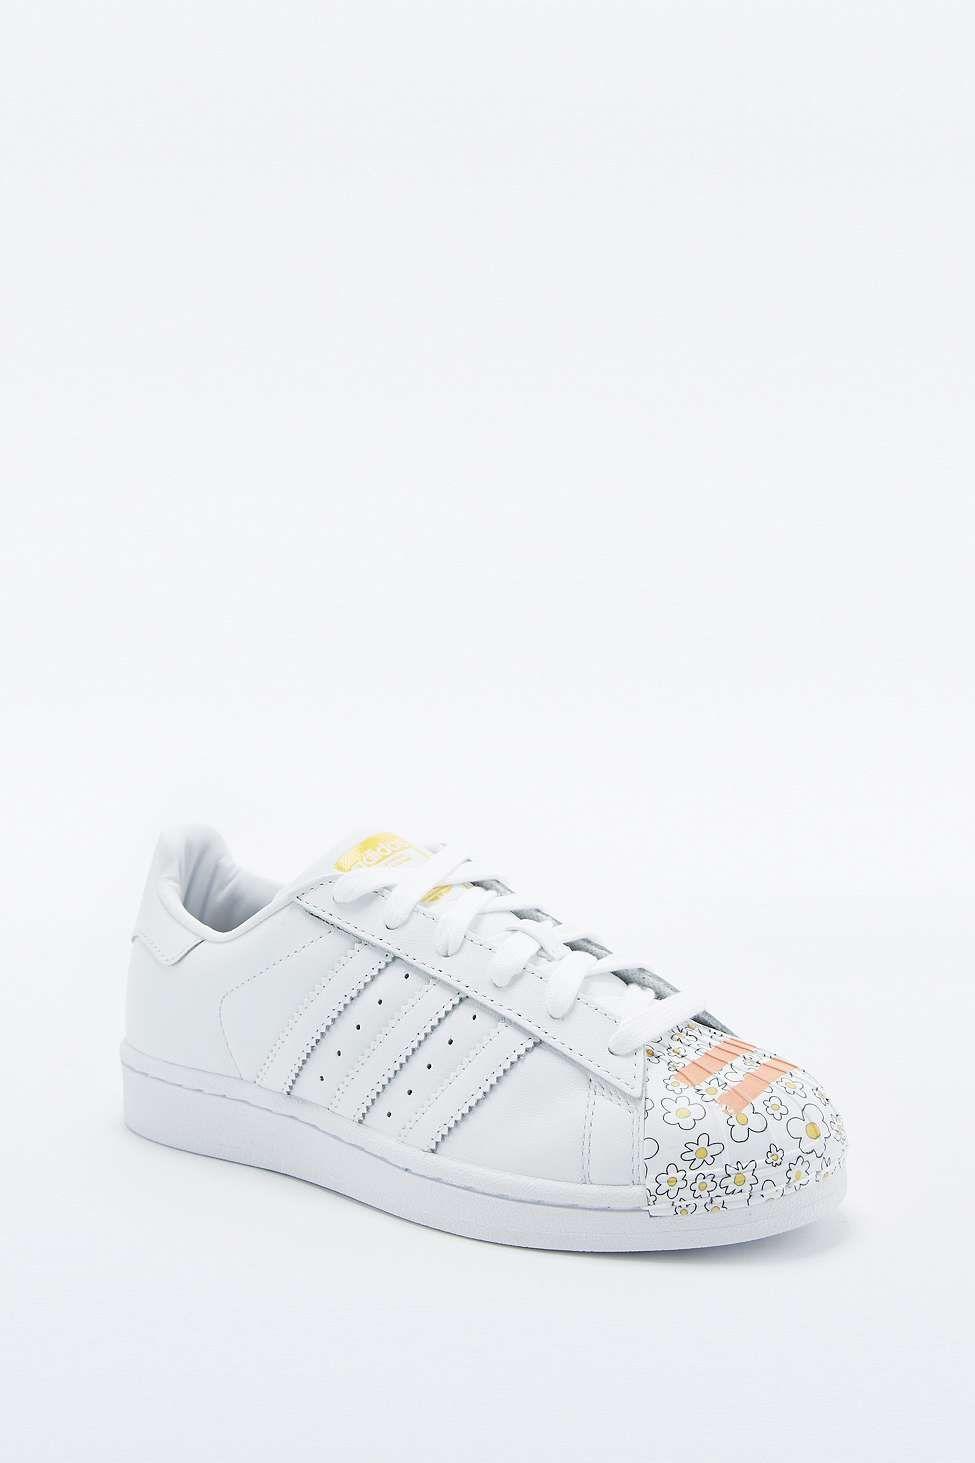 5819e96367000 adidas Originals Pharrell Supershell Superstar White Trainers ...